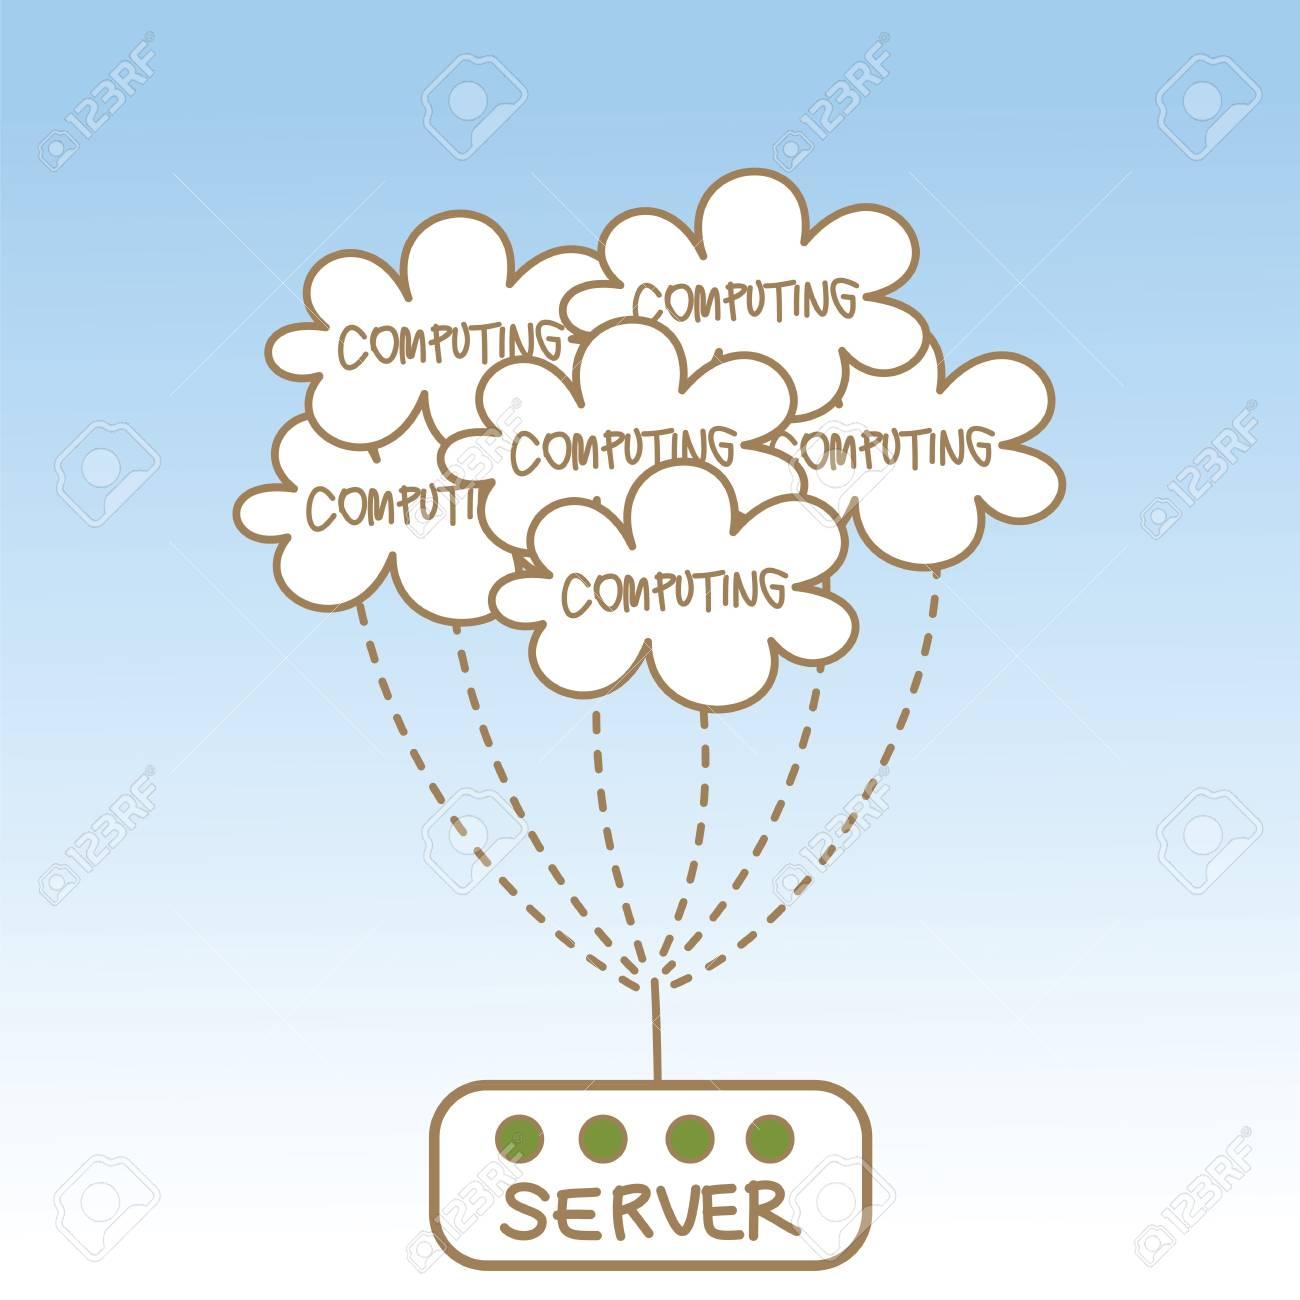 abstract of cloud computing server Stock Photo - 17389524